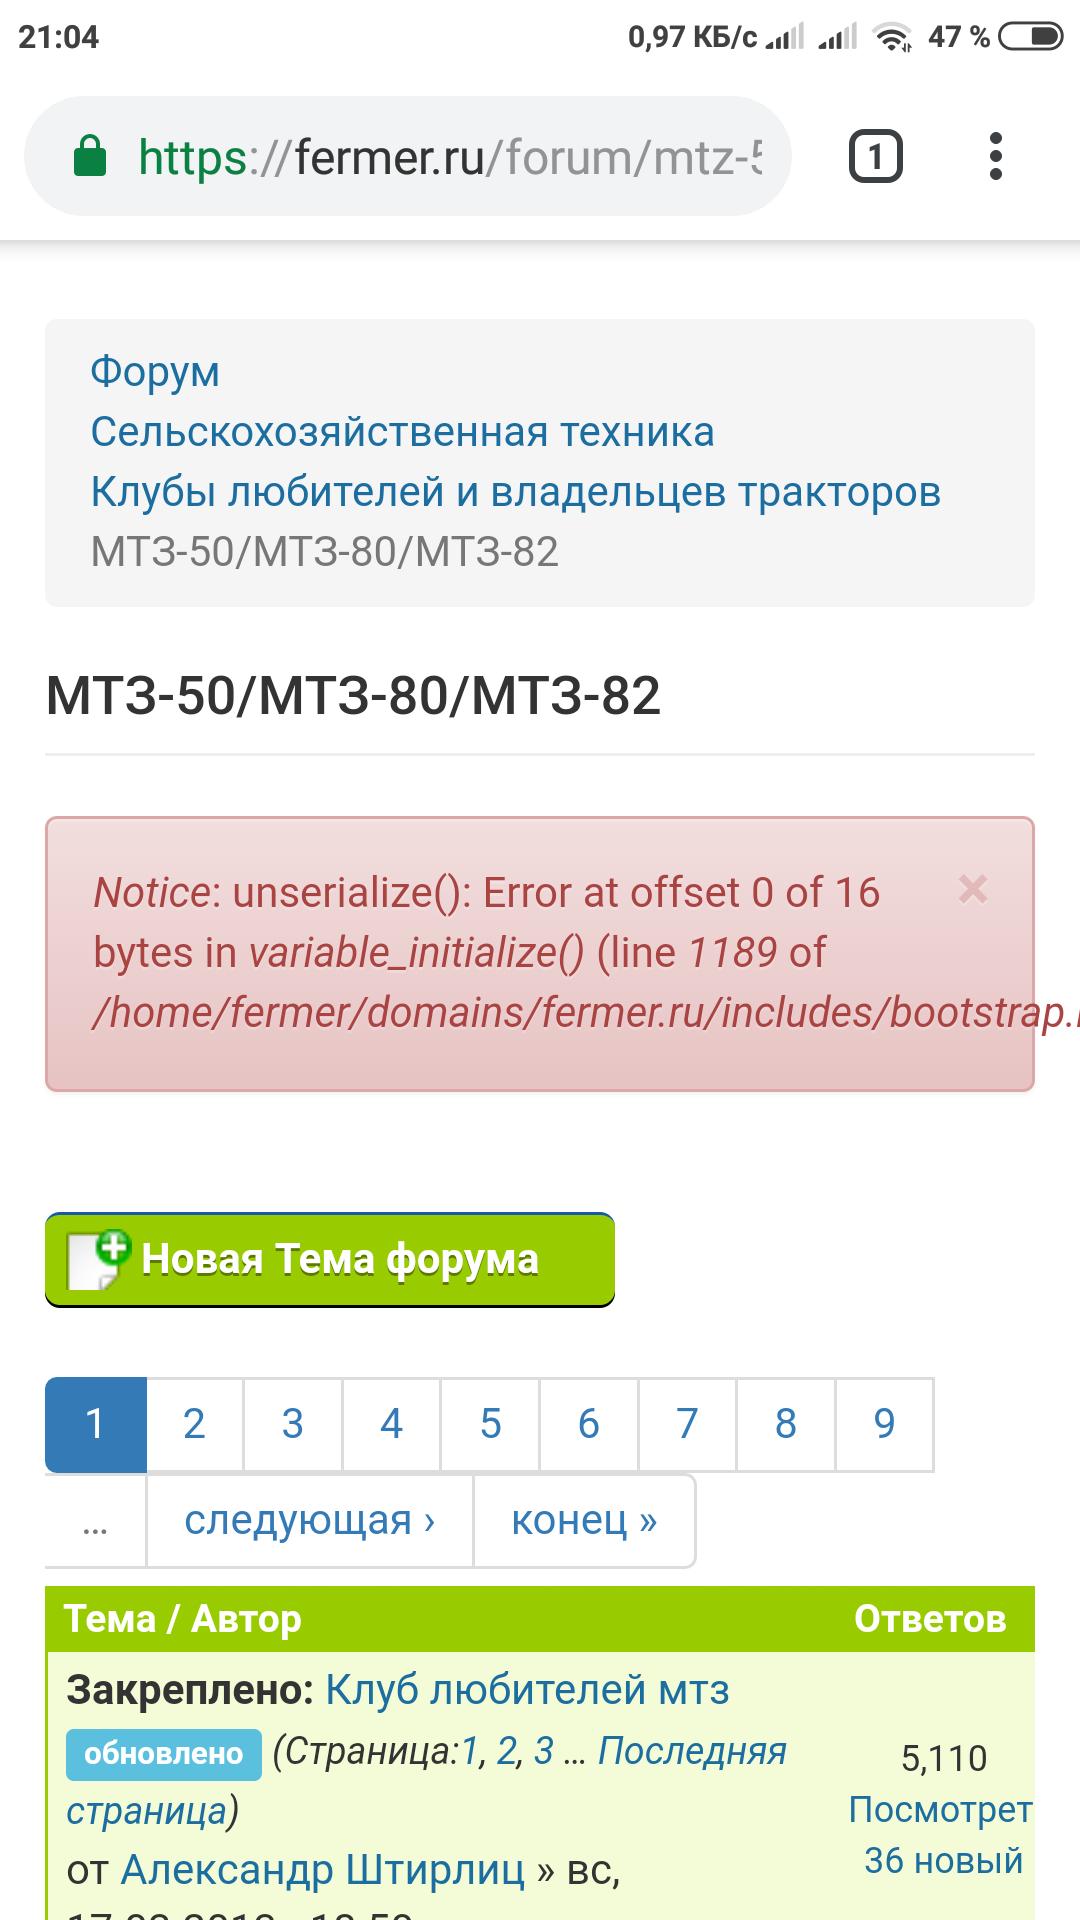 screenshot2019-01-18-21-04-13-001comandroidchrome.png